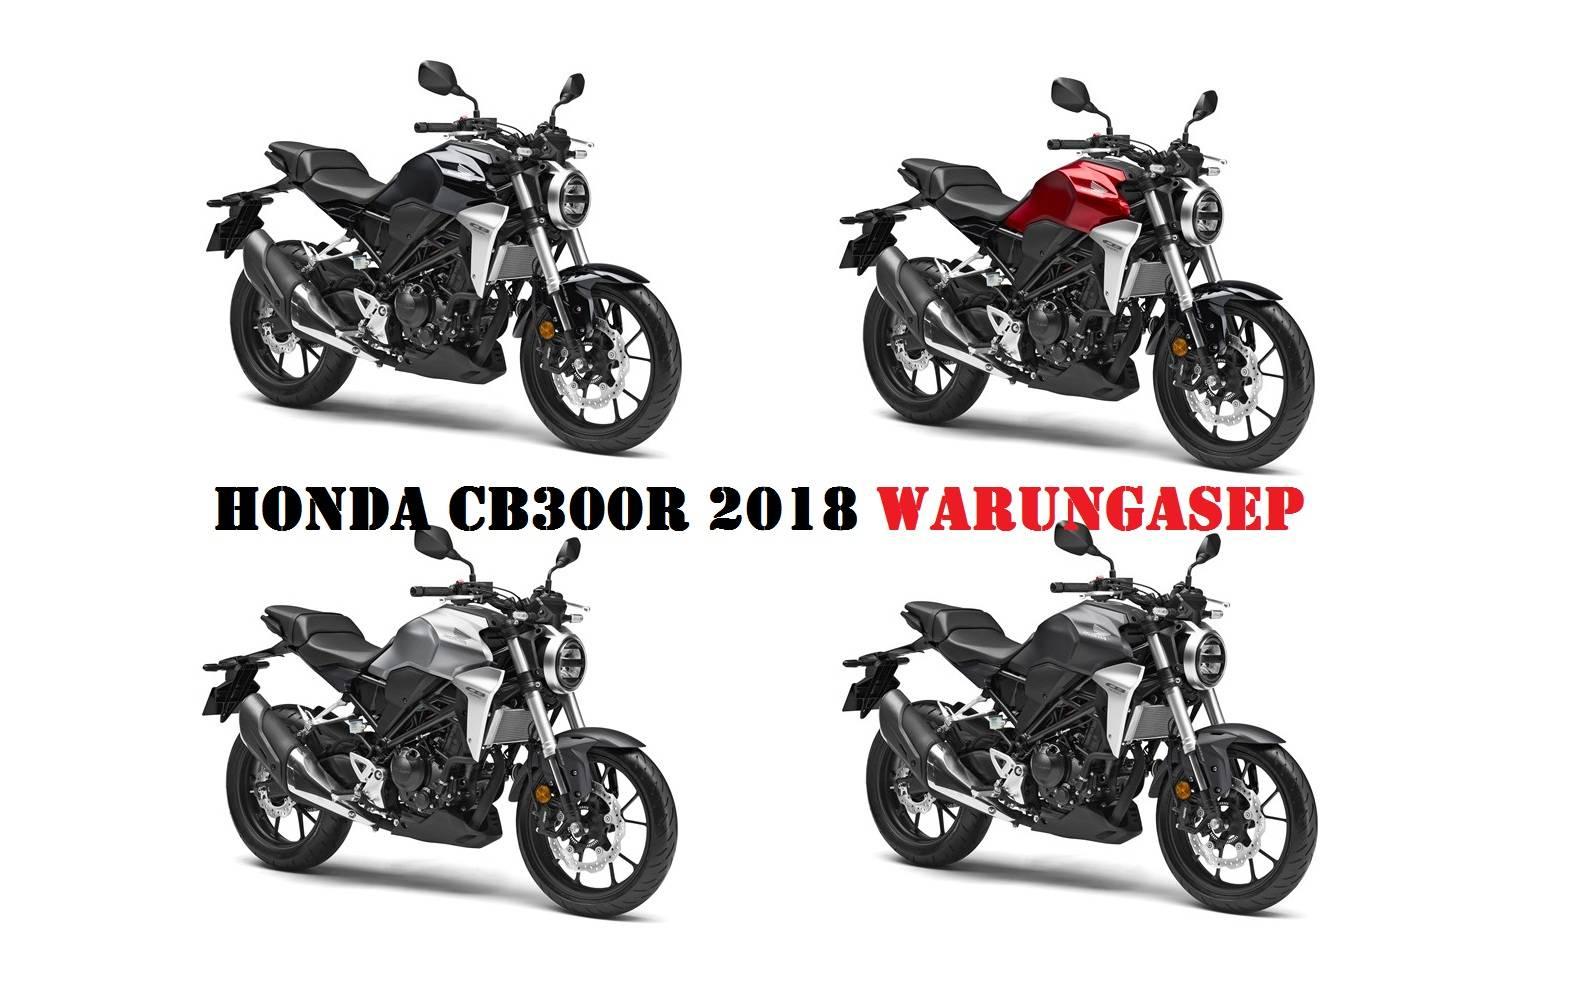 Honda CB300R 2018, Street Bike 300cc Bergaya Neo CafeRacer